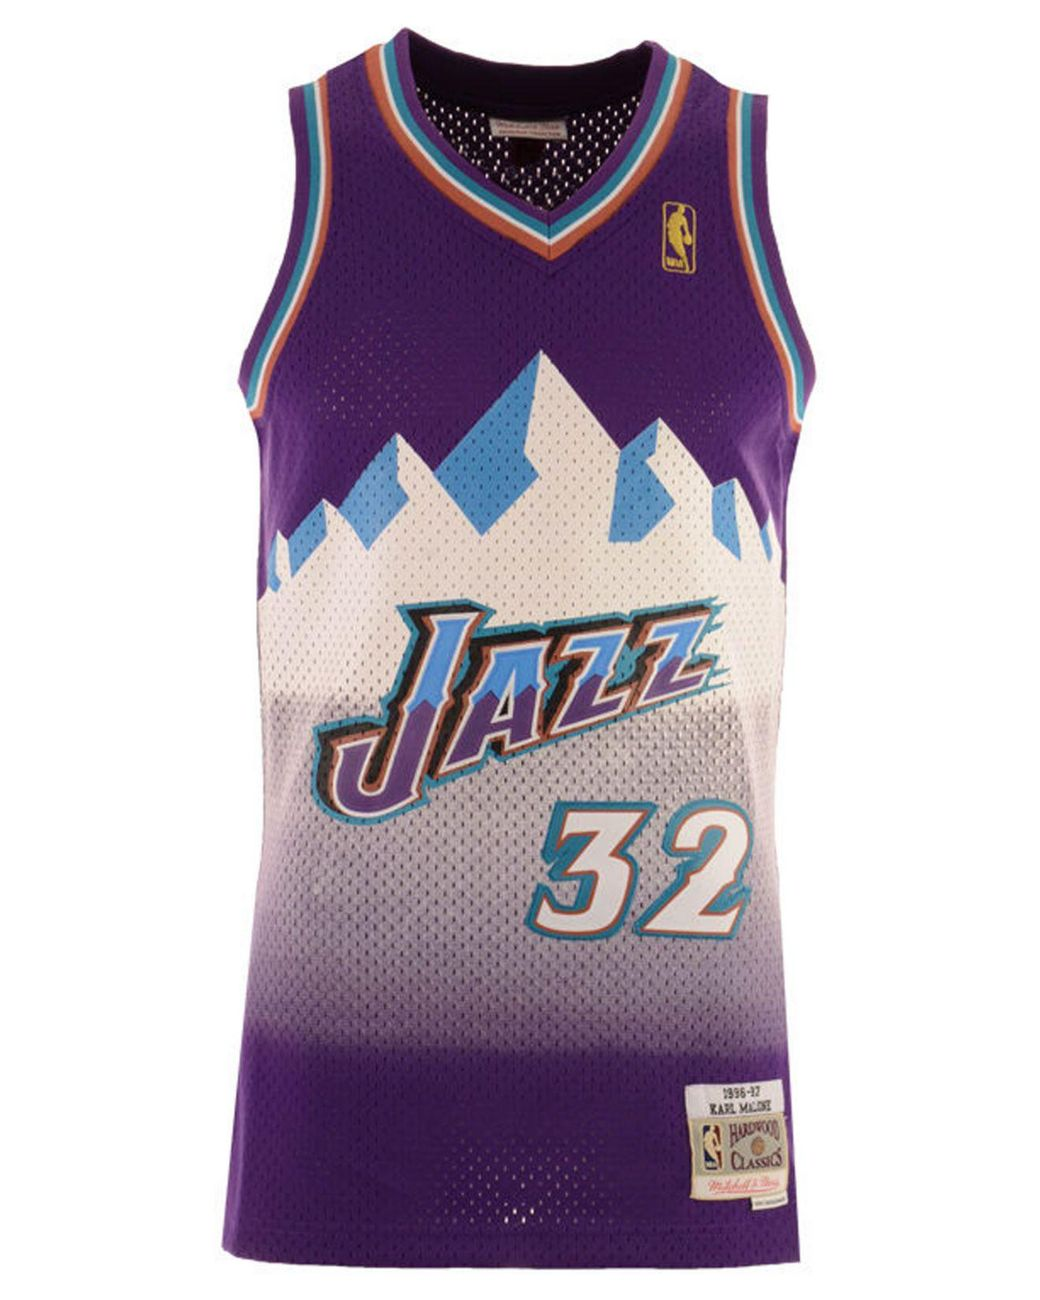 buy online 36d2b fca6f Men's Purple John Stockton Utah Jazz Hardwood Classic Swingman Jersey